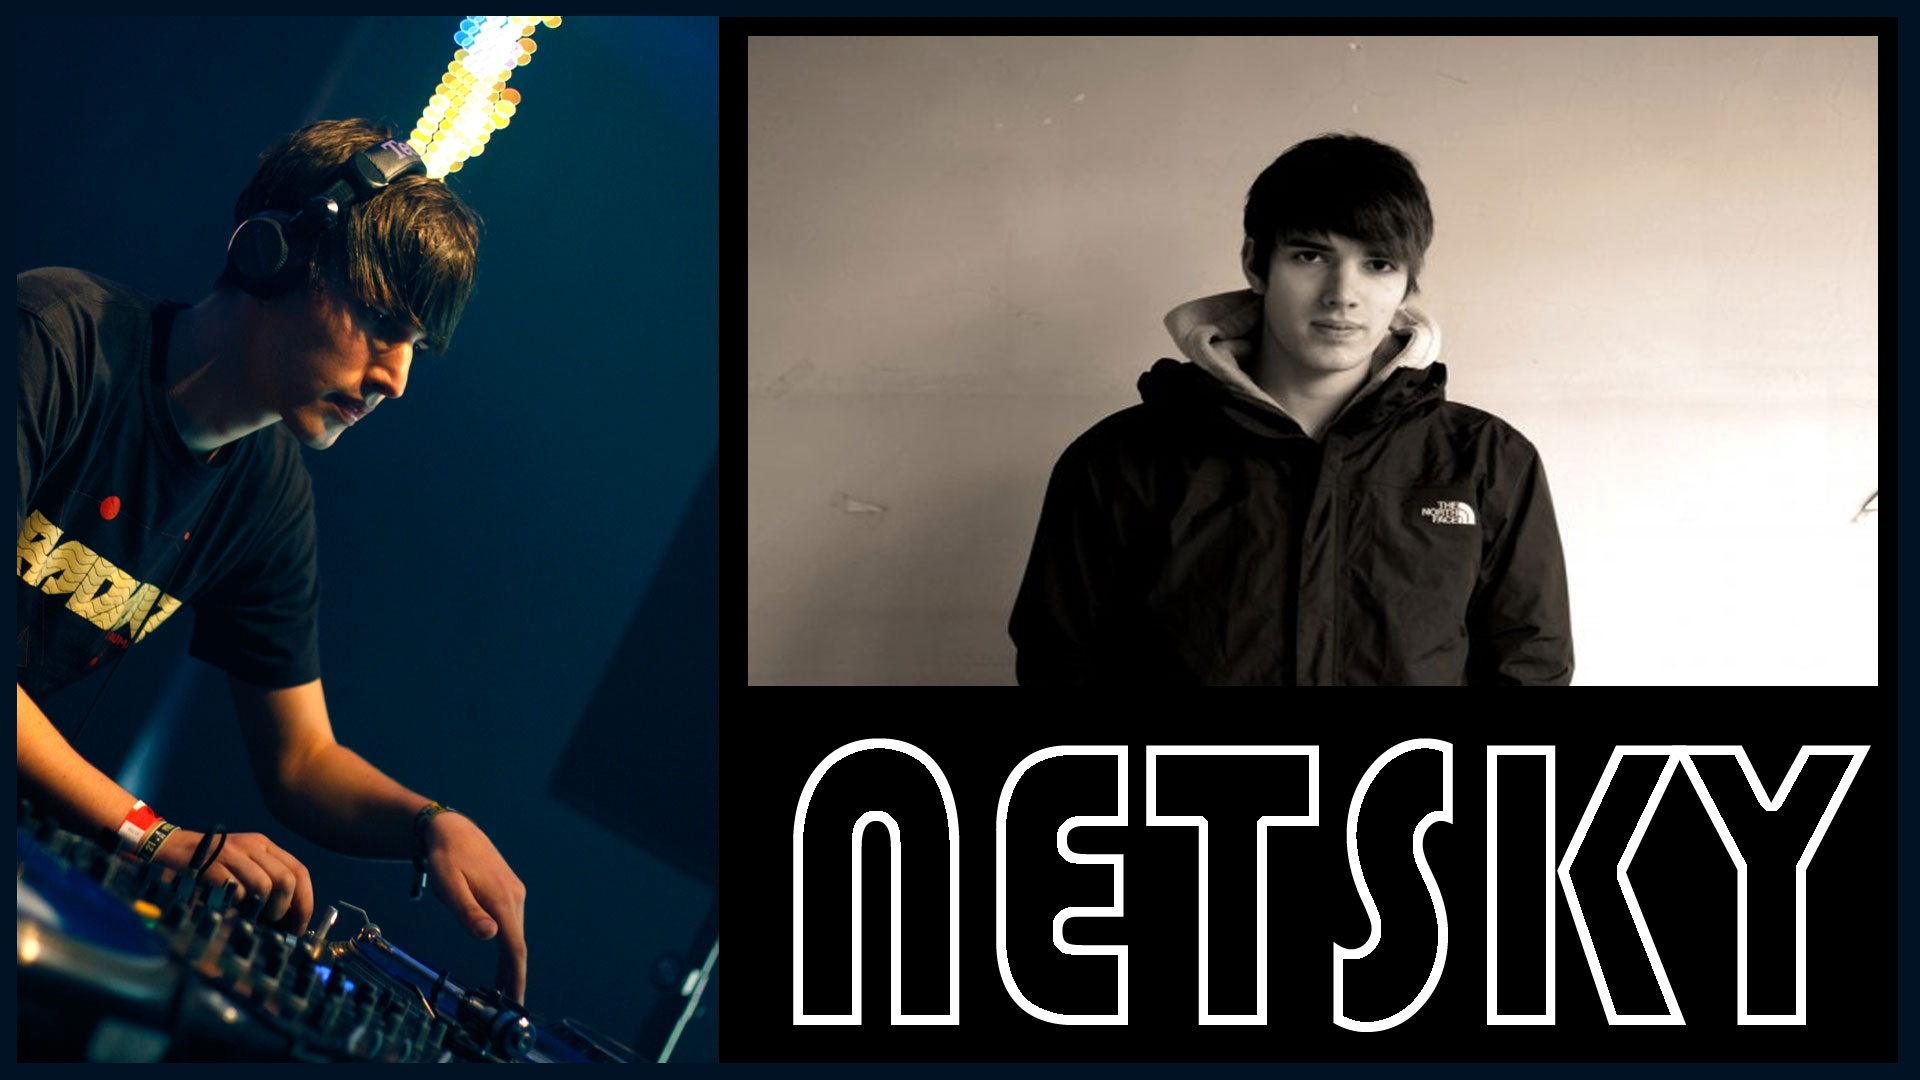 Netsky Man Jacket Console T shirt   Stock Photos Images HD 1920x1080